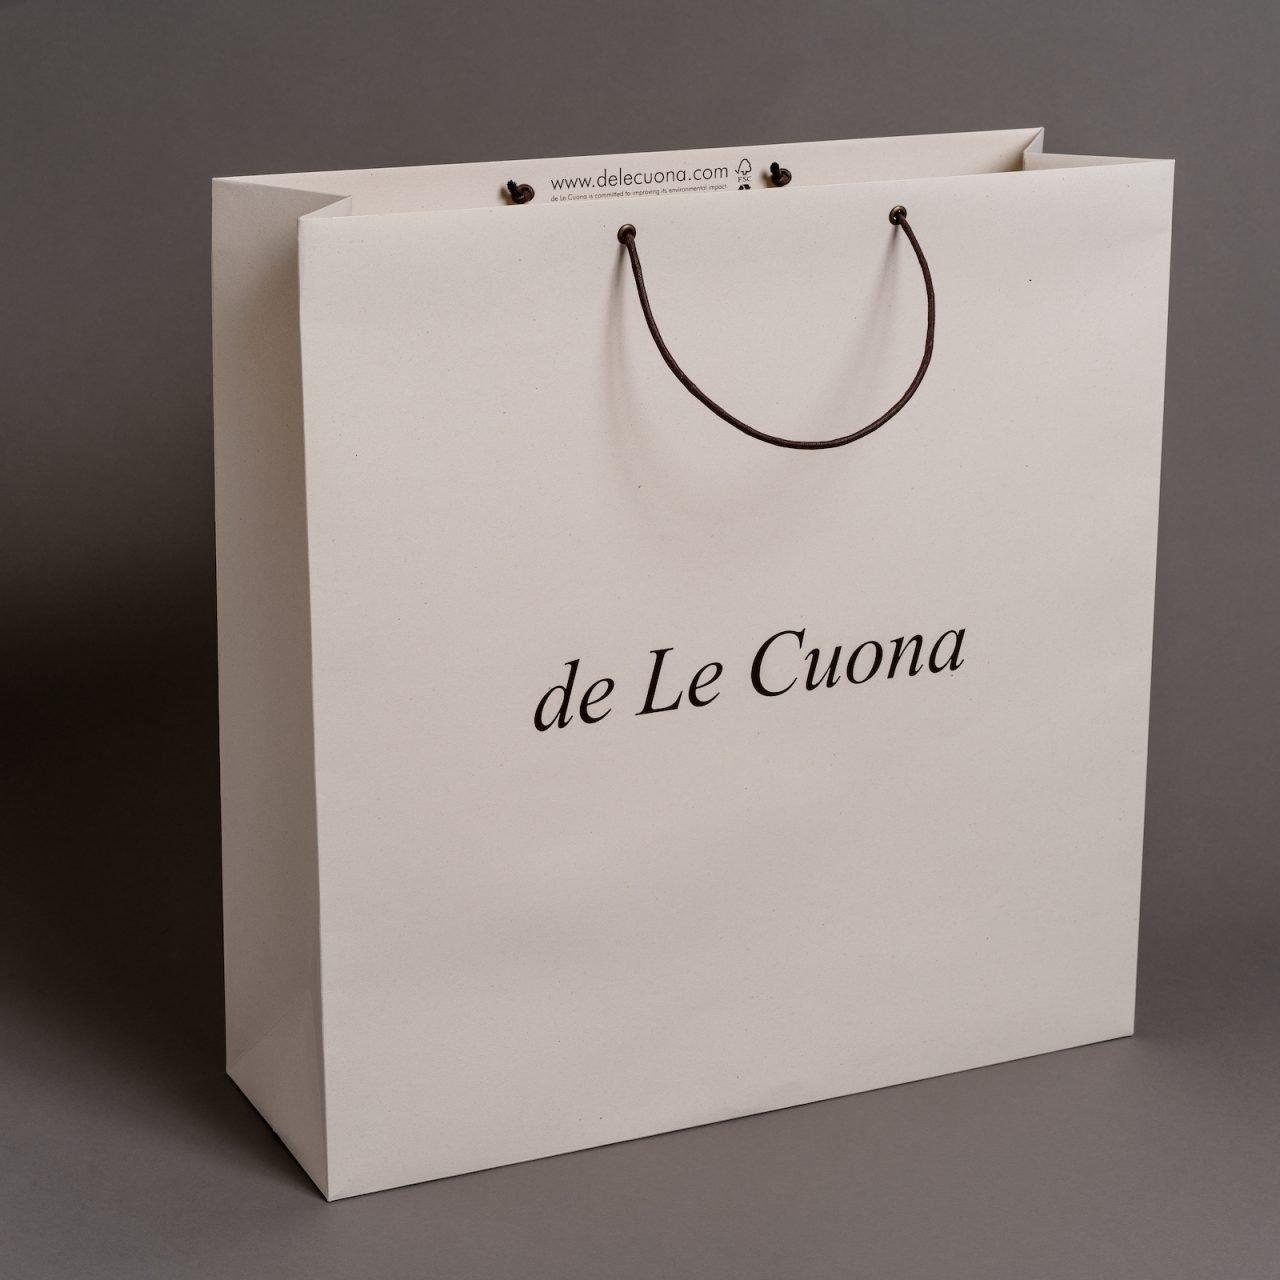 https://www.luxurypaperbags.net/wp-content/uploads/2021/09/Printed-Presentation-Boxes.jpg